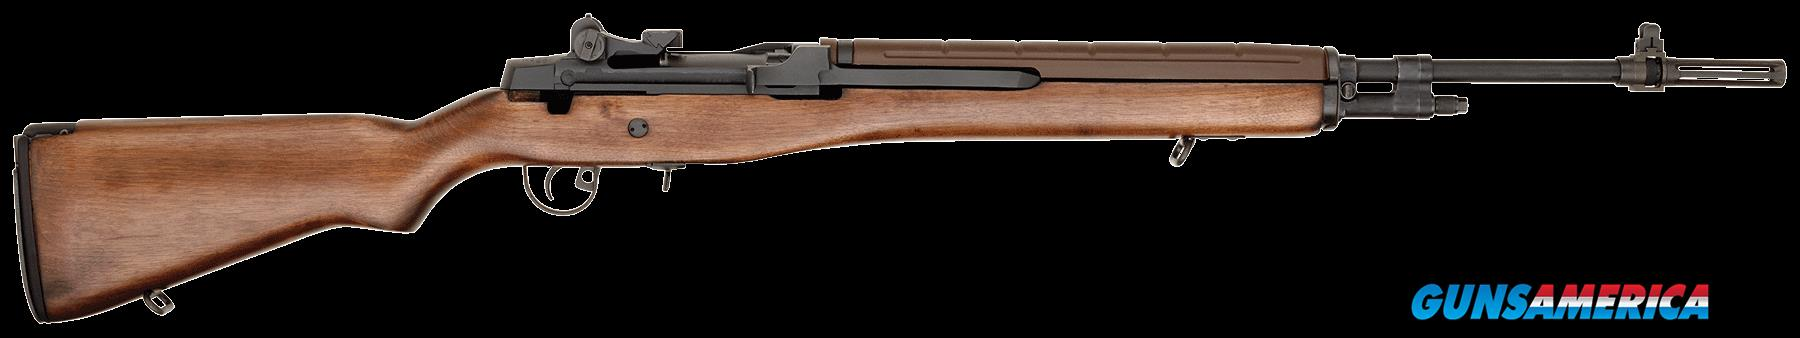 Springfield Armory M1a, Spg Ma9222ca    M1a Std   308       Wal Bl Loaded  Guns > Pistols > 1911 Pistol Copies (non-Colt)